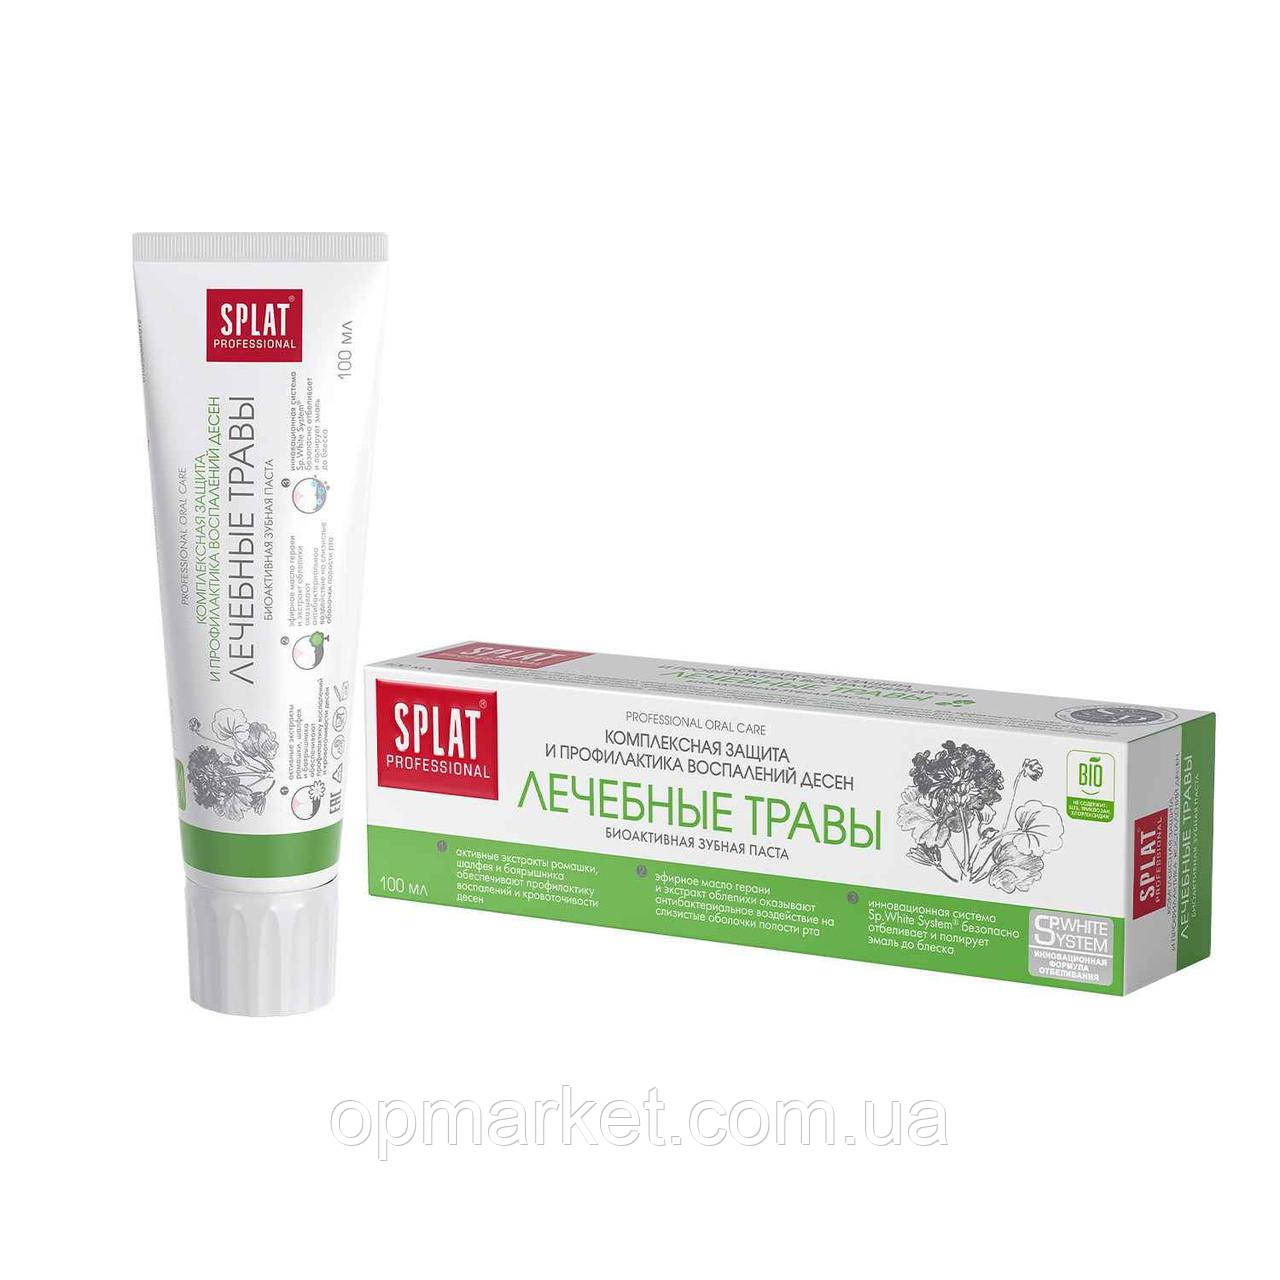 Зубна Паста Протизапальна Splat Professional Medical Herbs Сплат Лікувальні Трави 100 мл